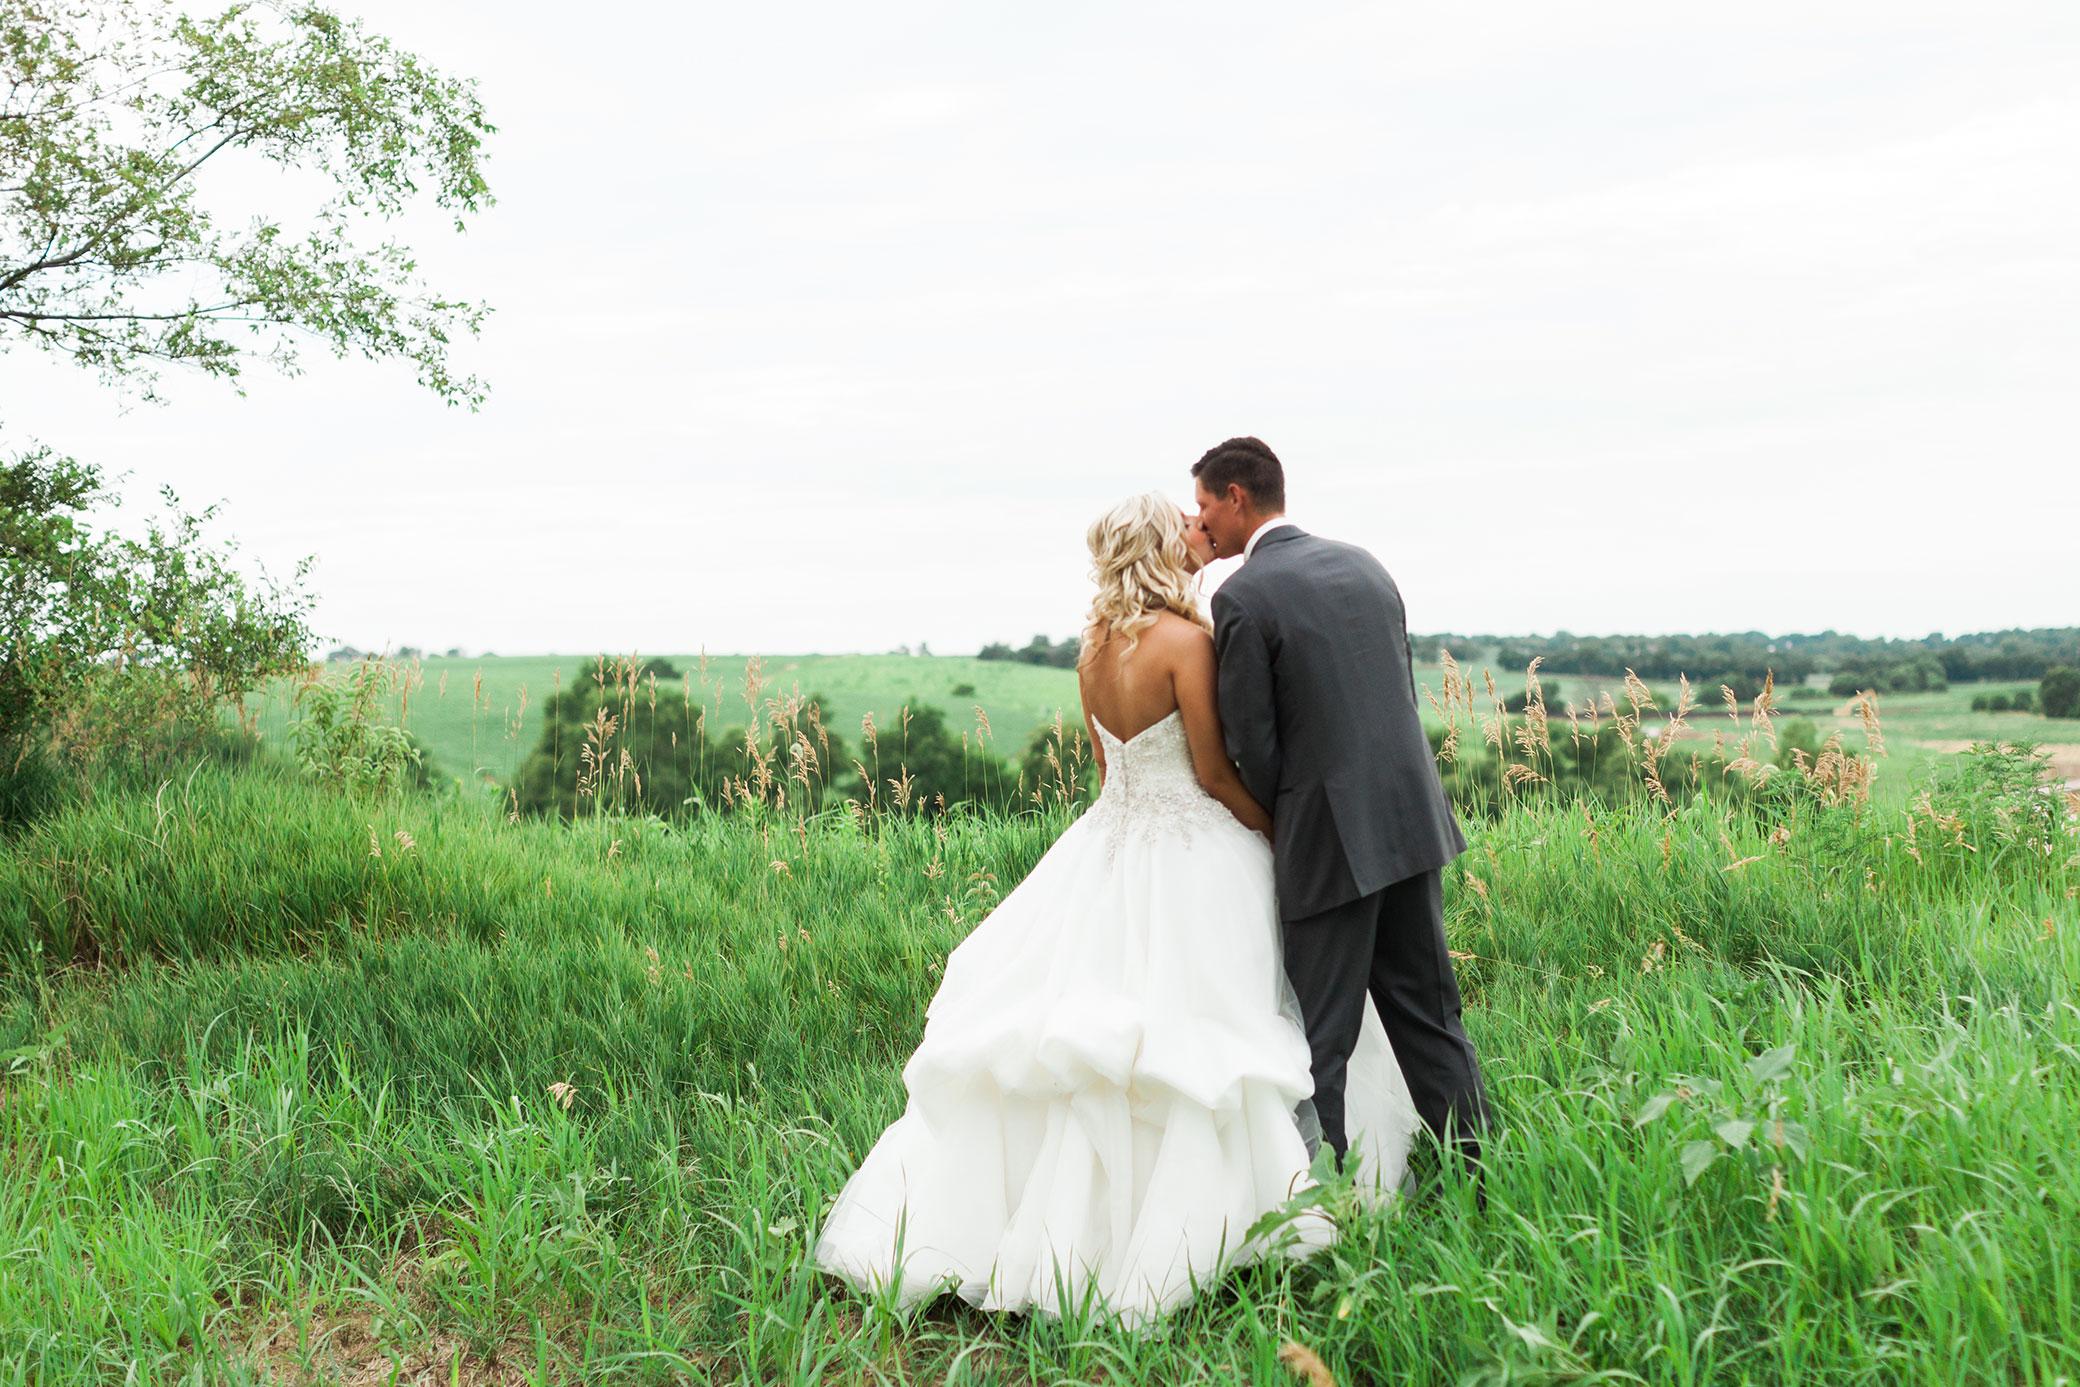 Indian_Creek_Country_Club_Omaha_Wedding_Danielle_Paul-314.jpg